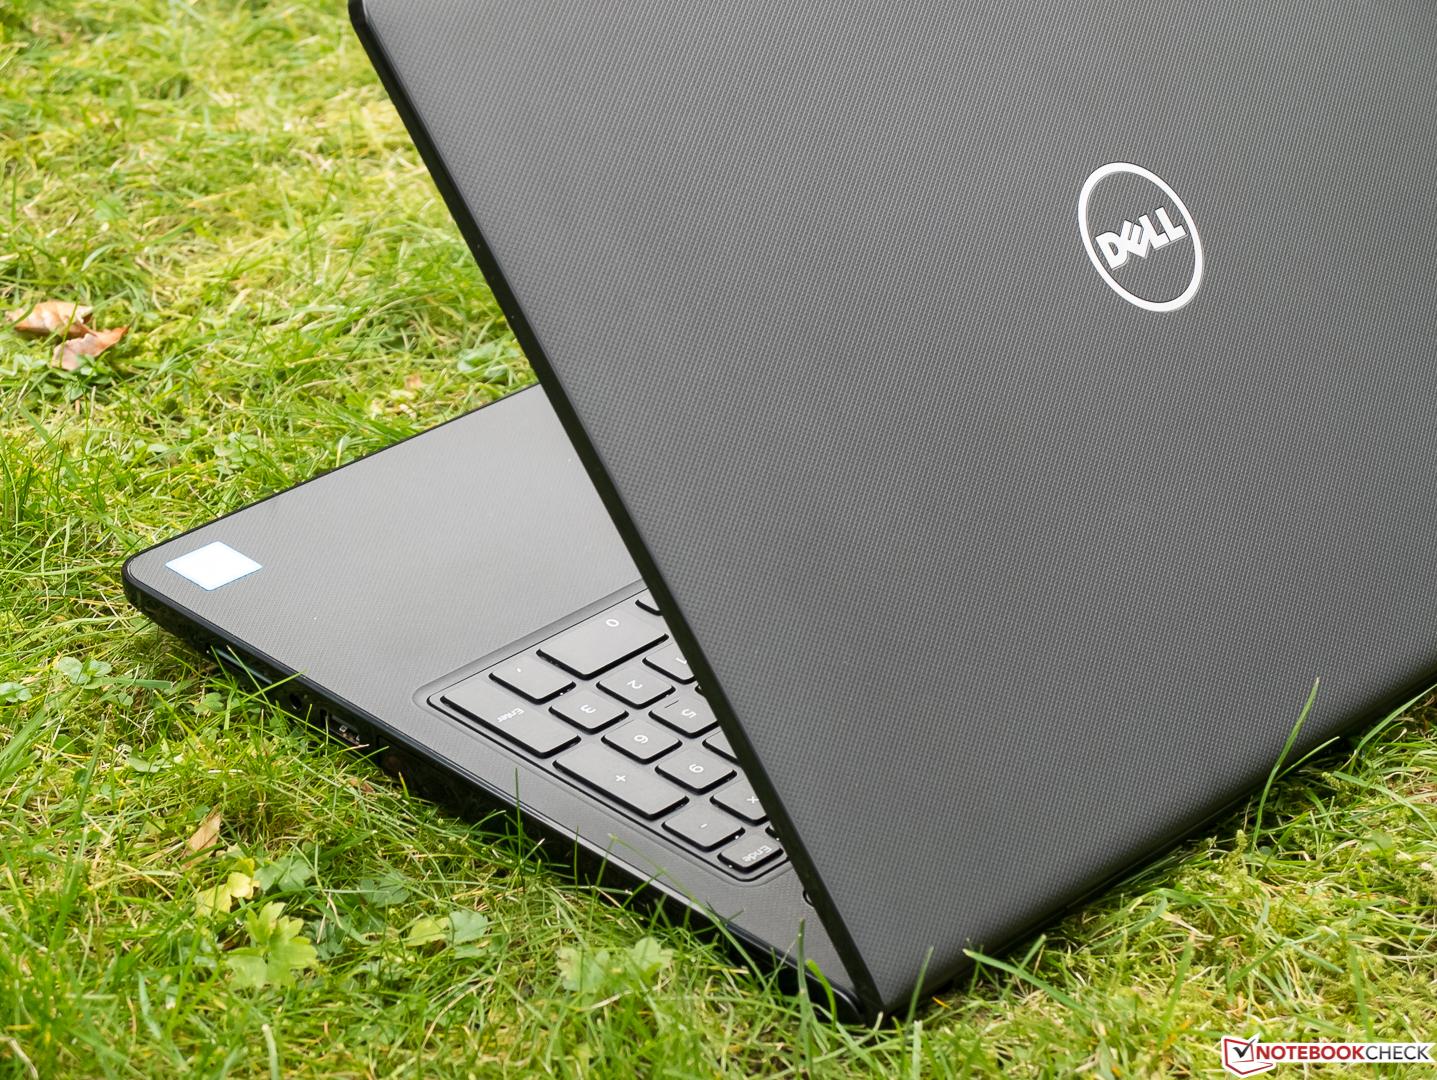 Dell Vostro 15 3568 7200u 256gb Laptop Review